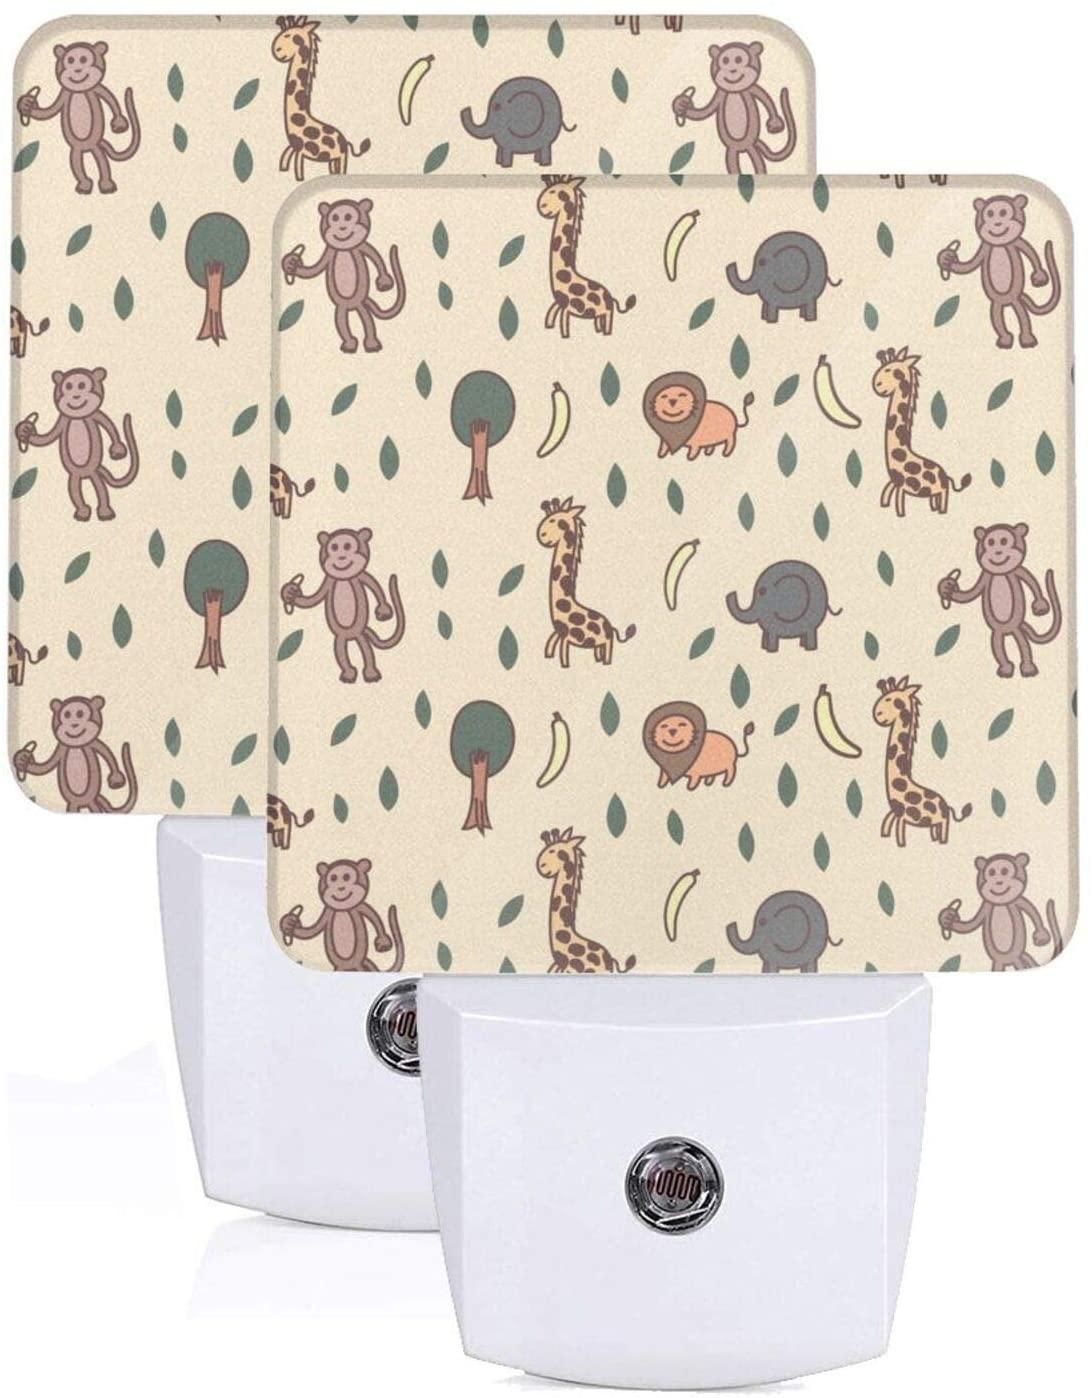 Feihuang Printing Giraffe Lion Elephant Monkey Patterns On Plug-in Led Night Light Warm White Nightlight for Bedroom Bathroom Hallway Stairways(0.5w 2-Pack)